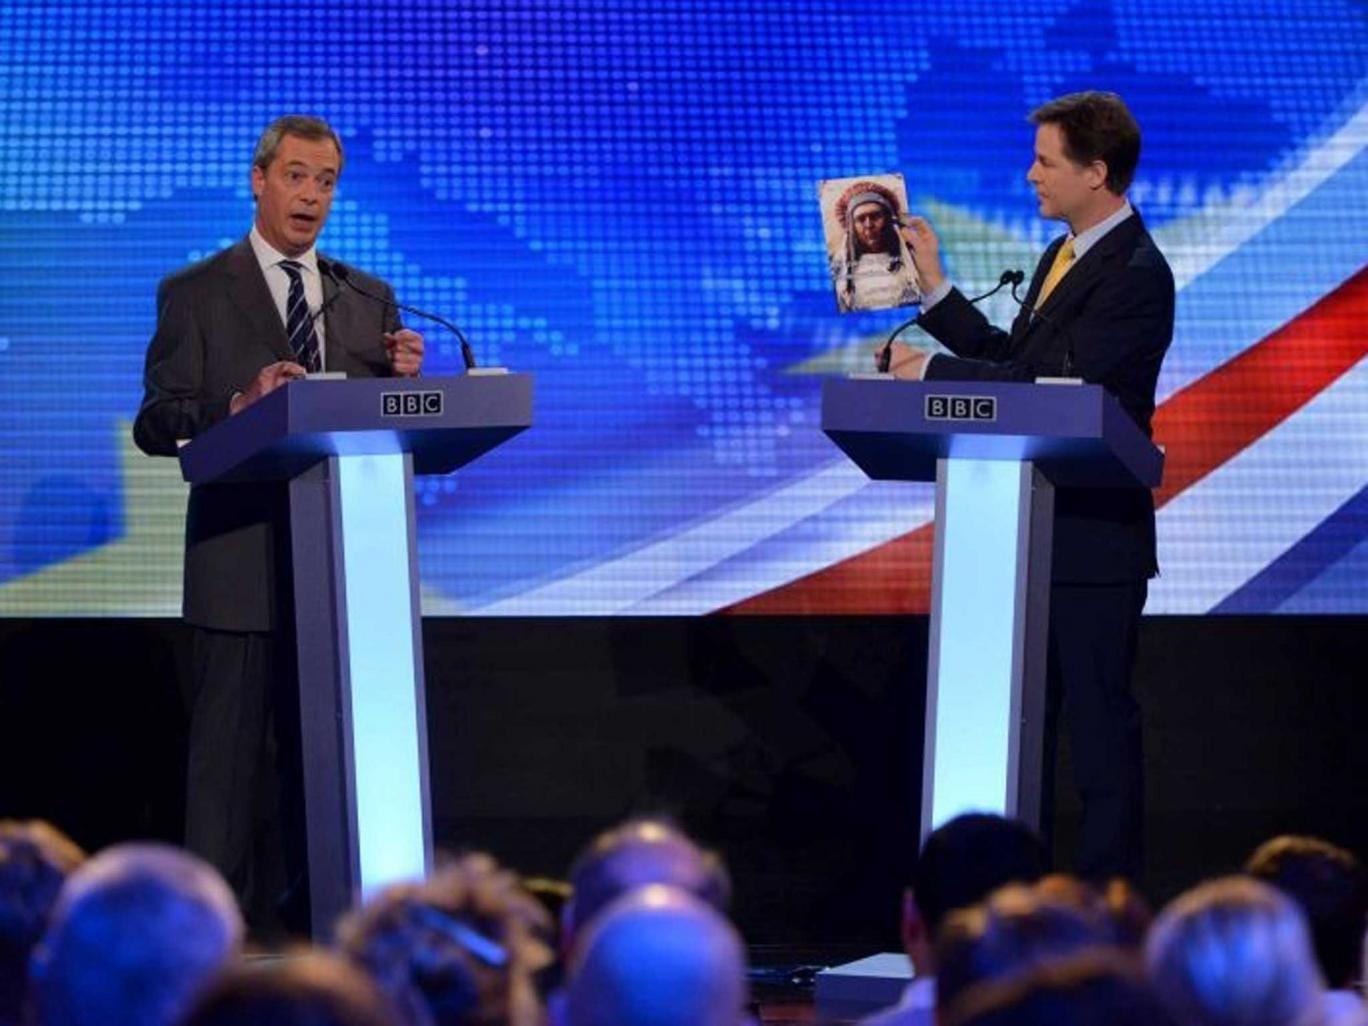 Nigel Farage (left) benefited from the EU debate against Nick Clegg